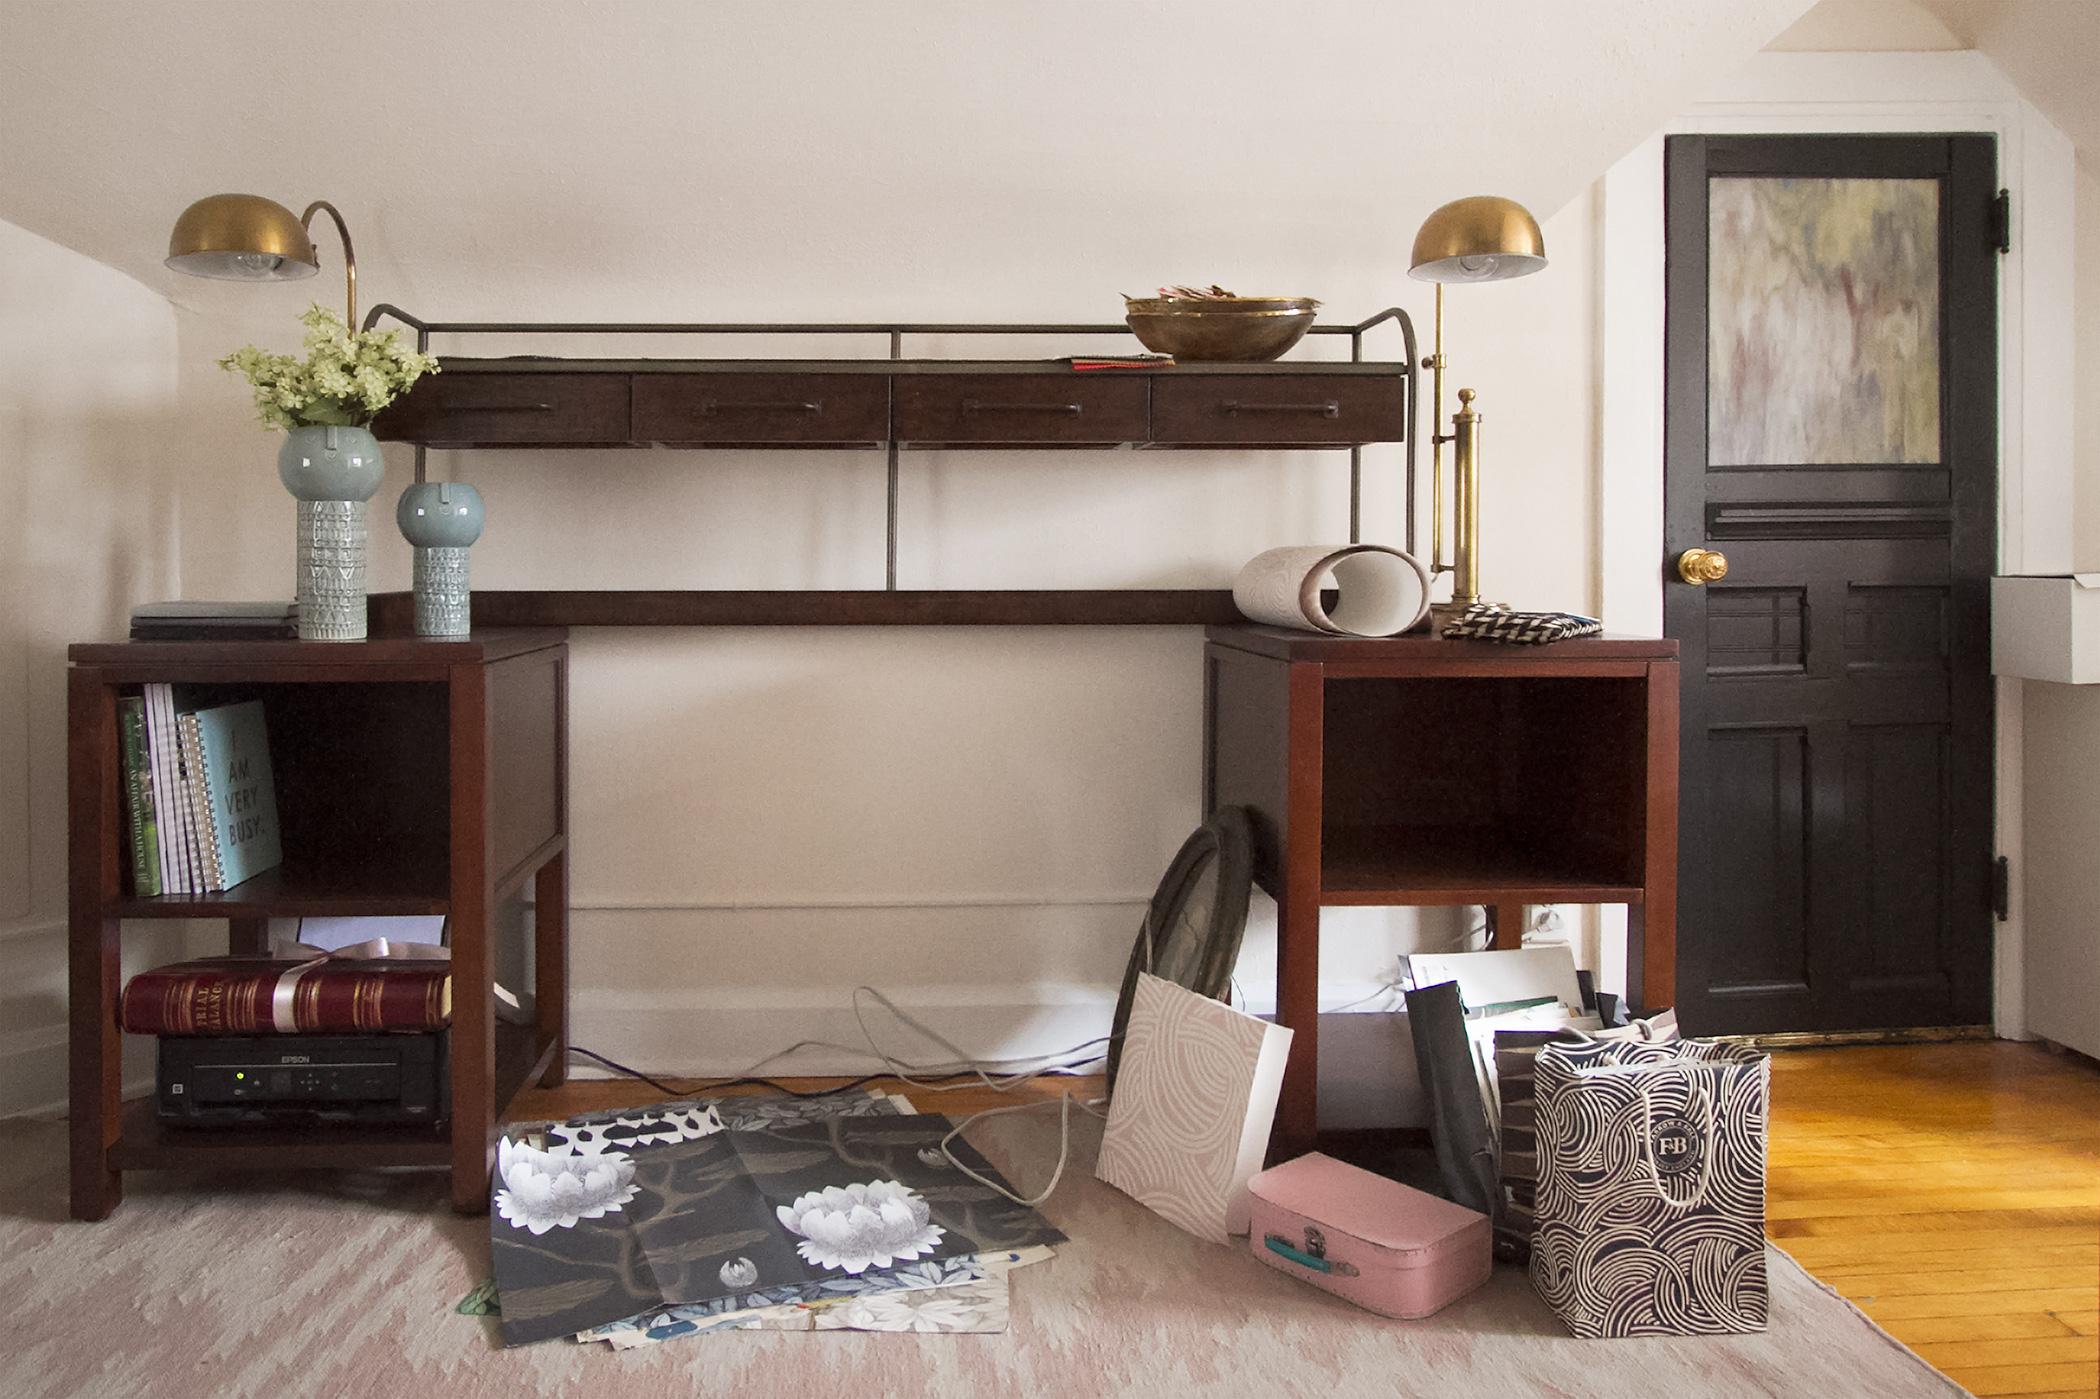 Modular Home Office Furniture Designs Ideas Plans: Update: Modular Home Office Furniture